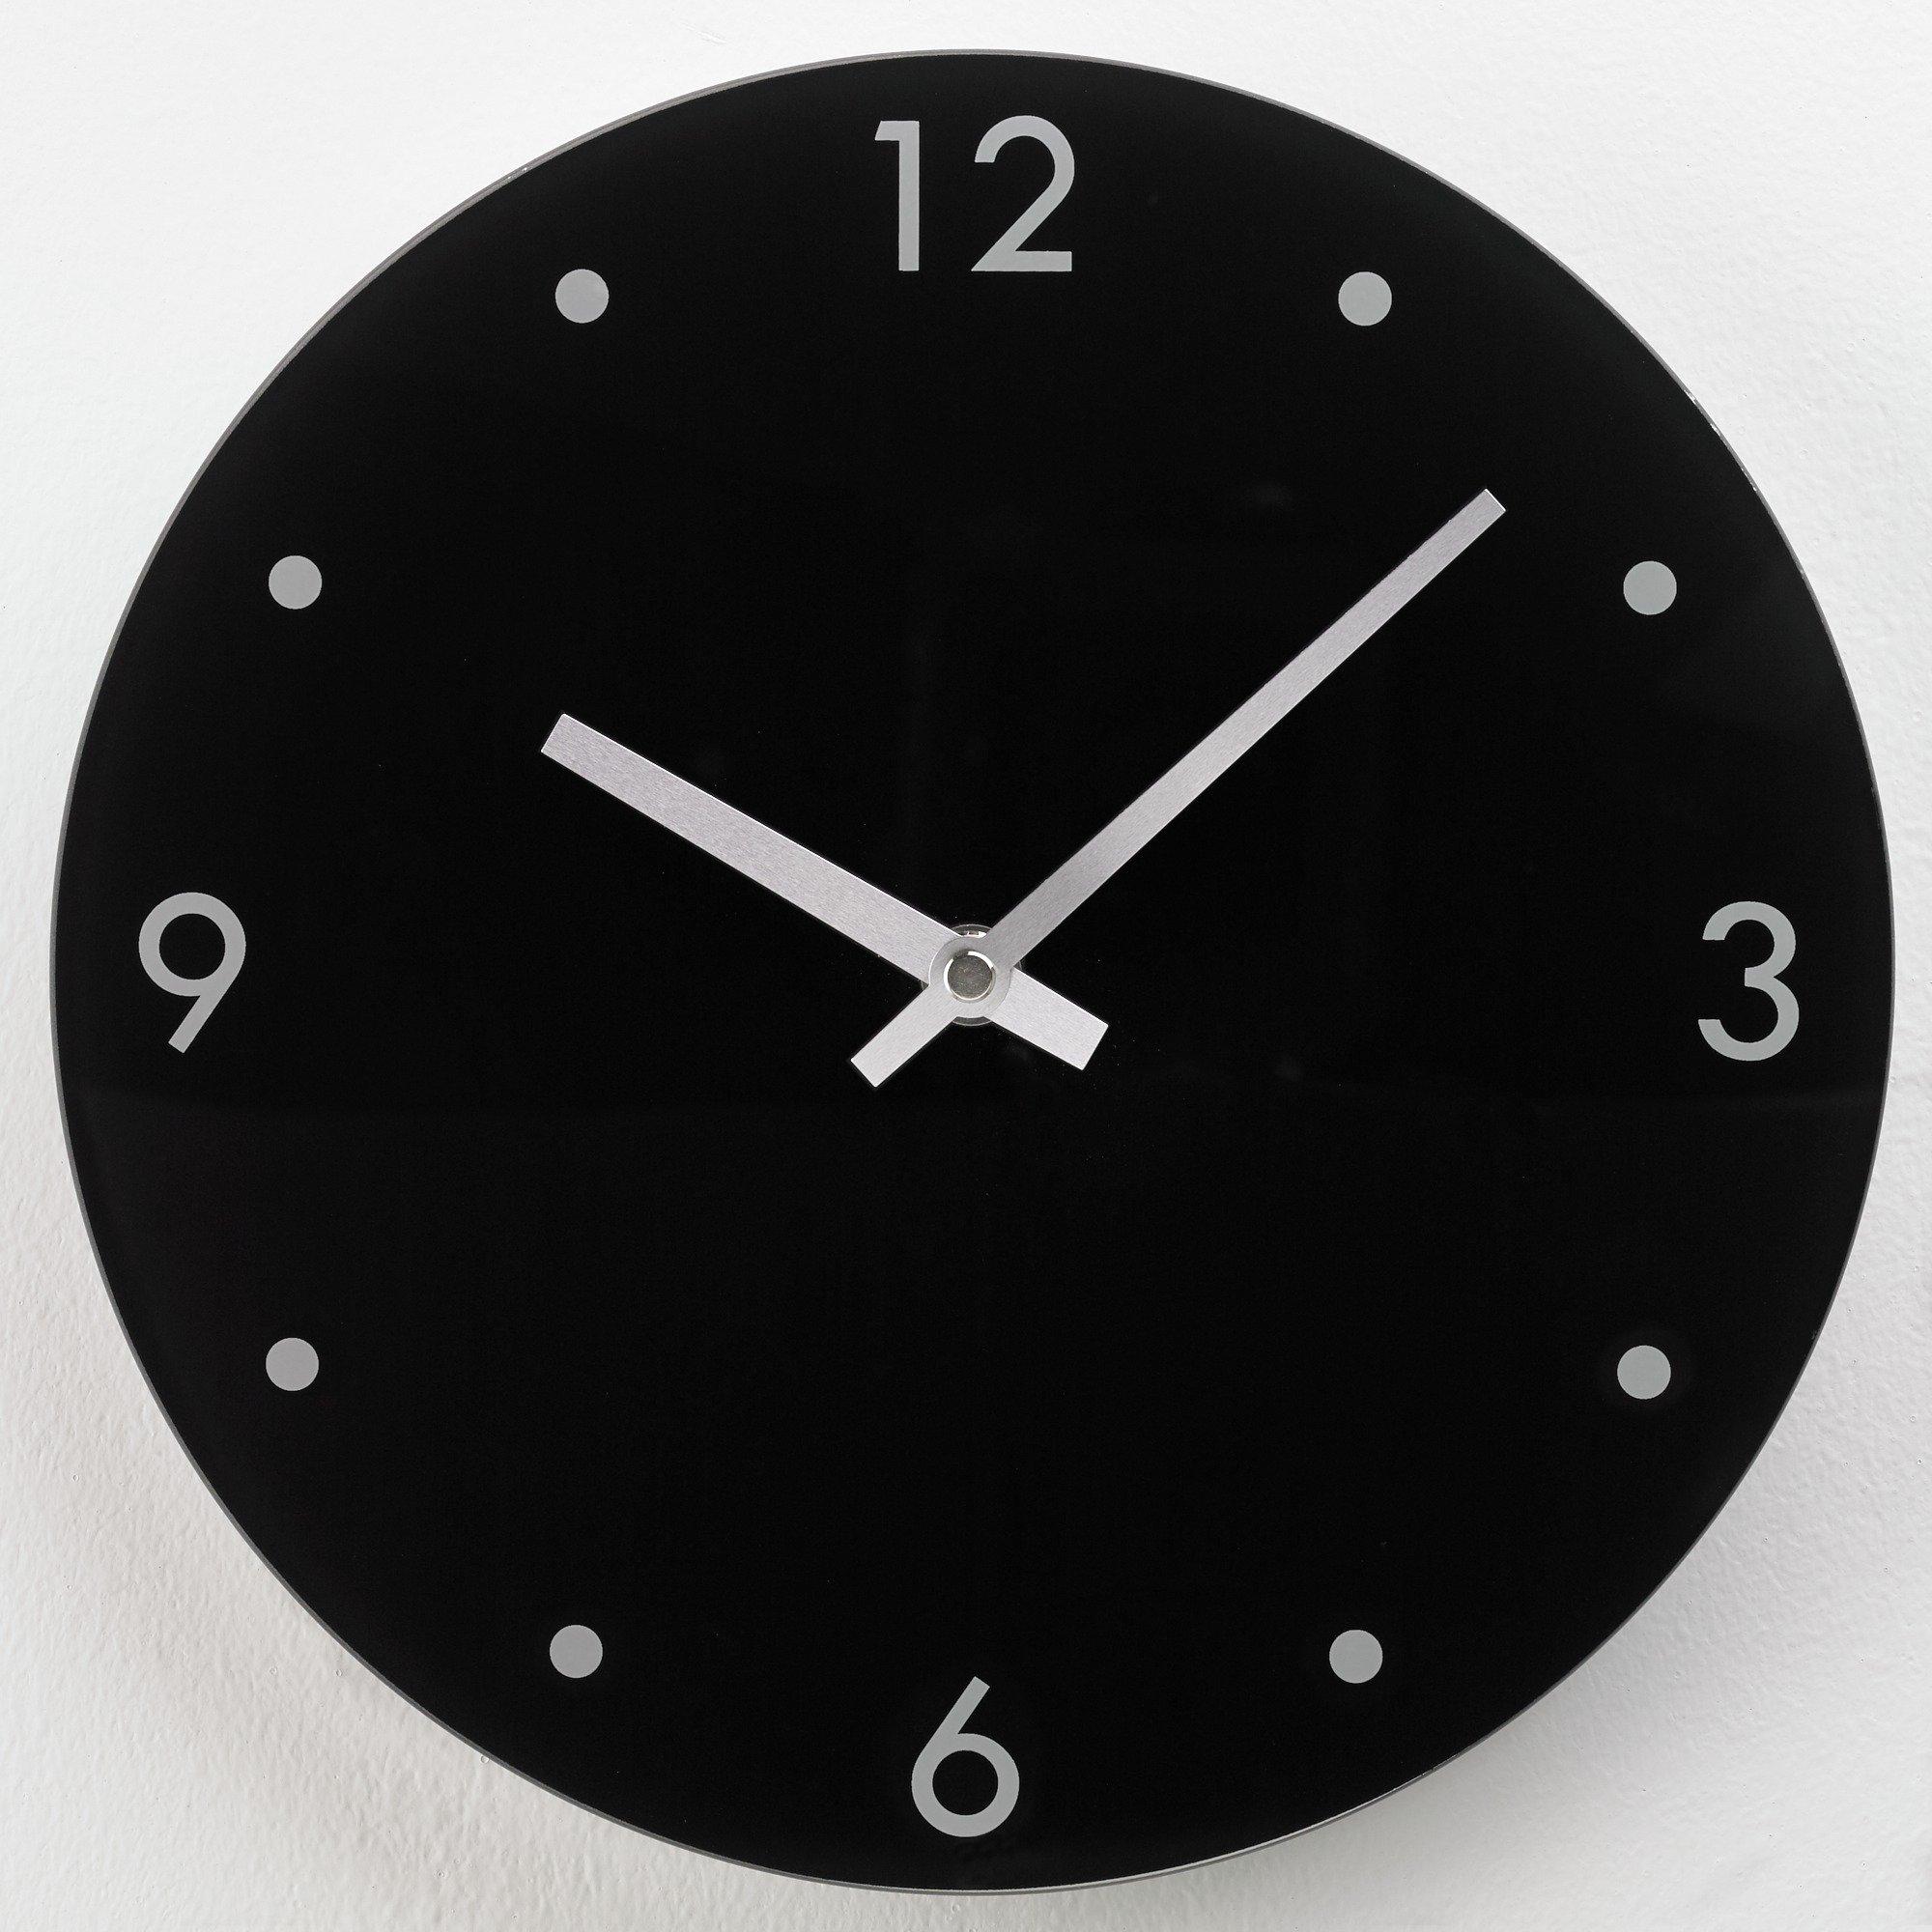 Black Kitchen Clock Argos: Wall, Mantel, Carriage, Digital Radio